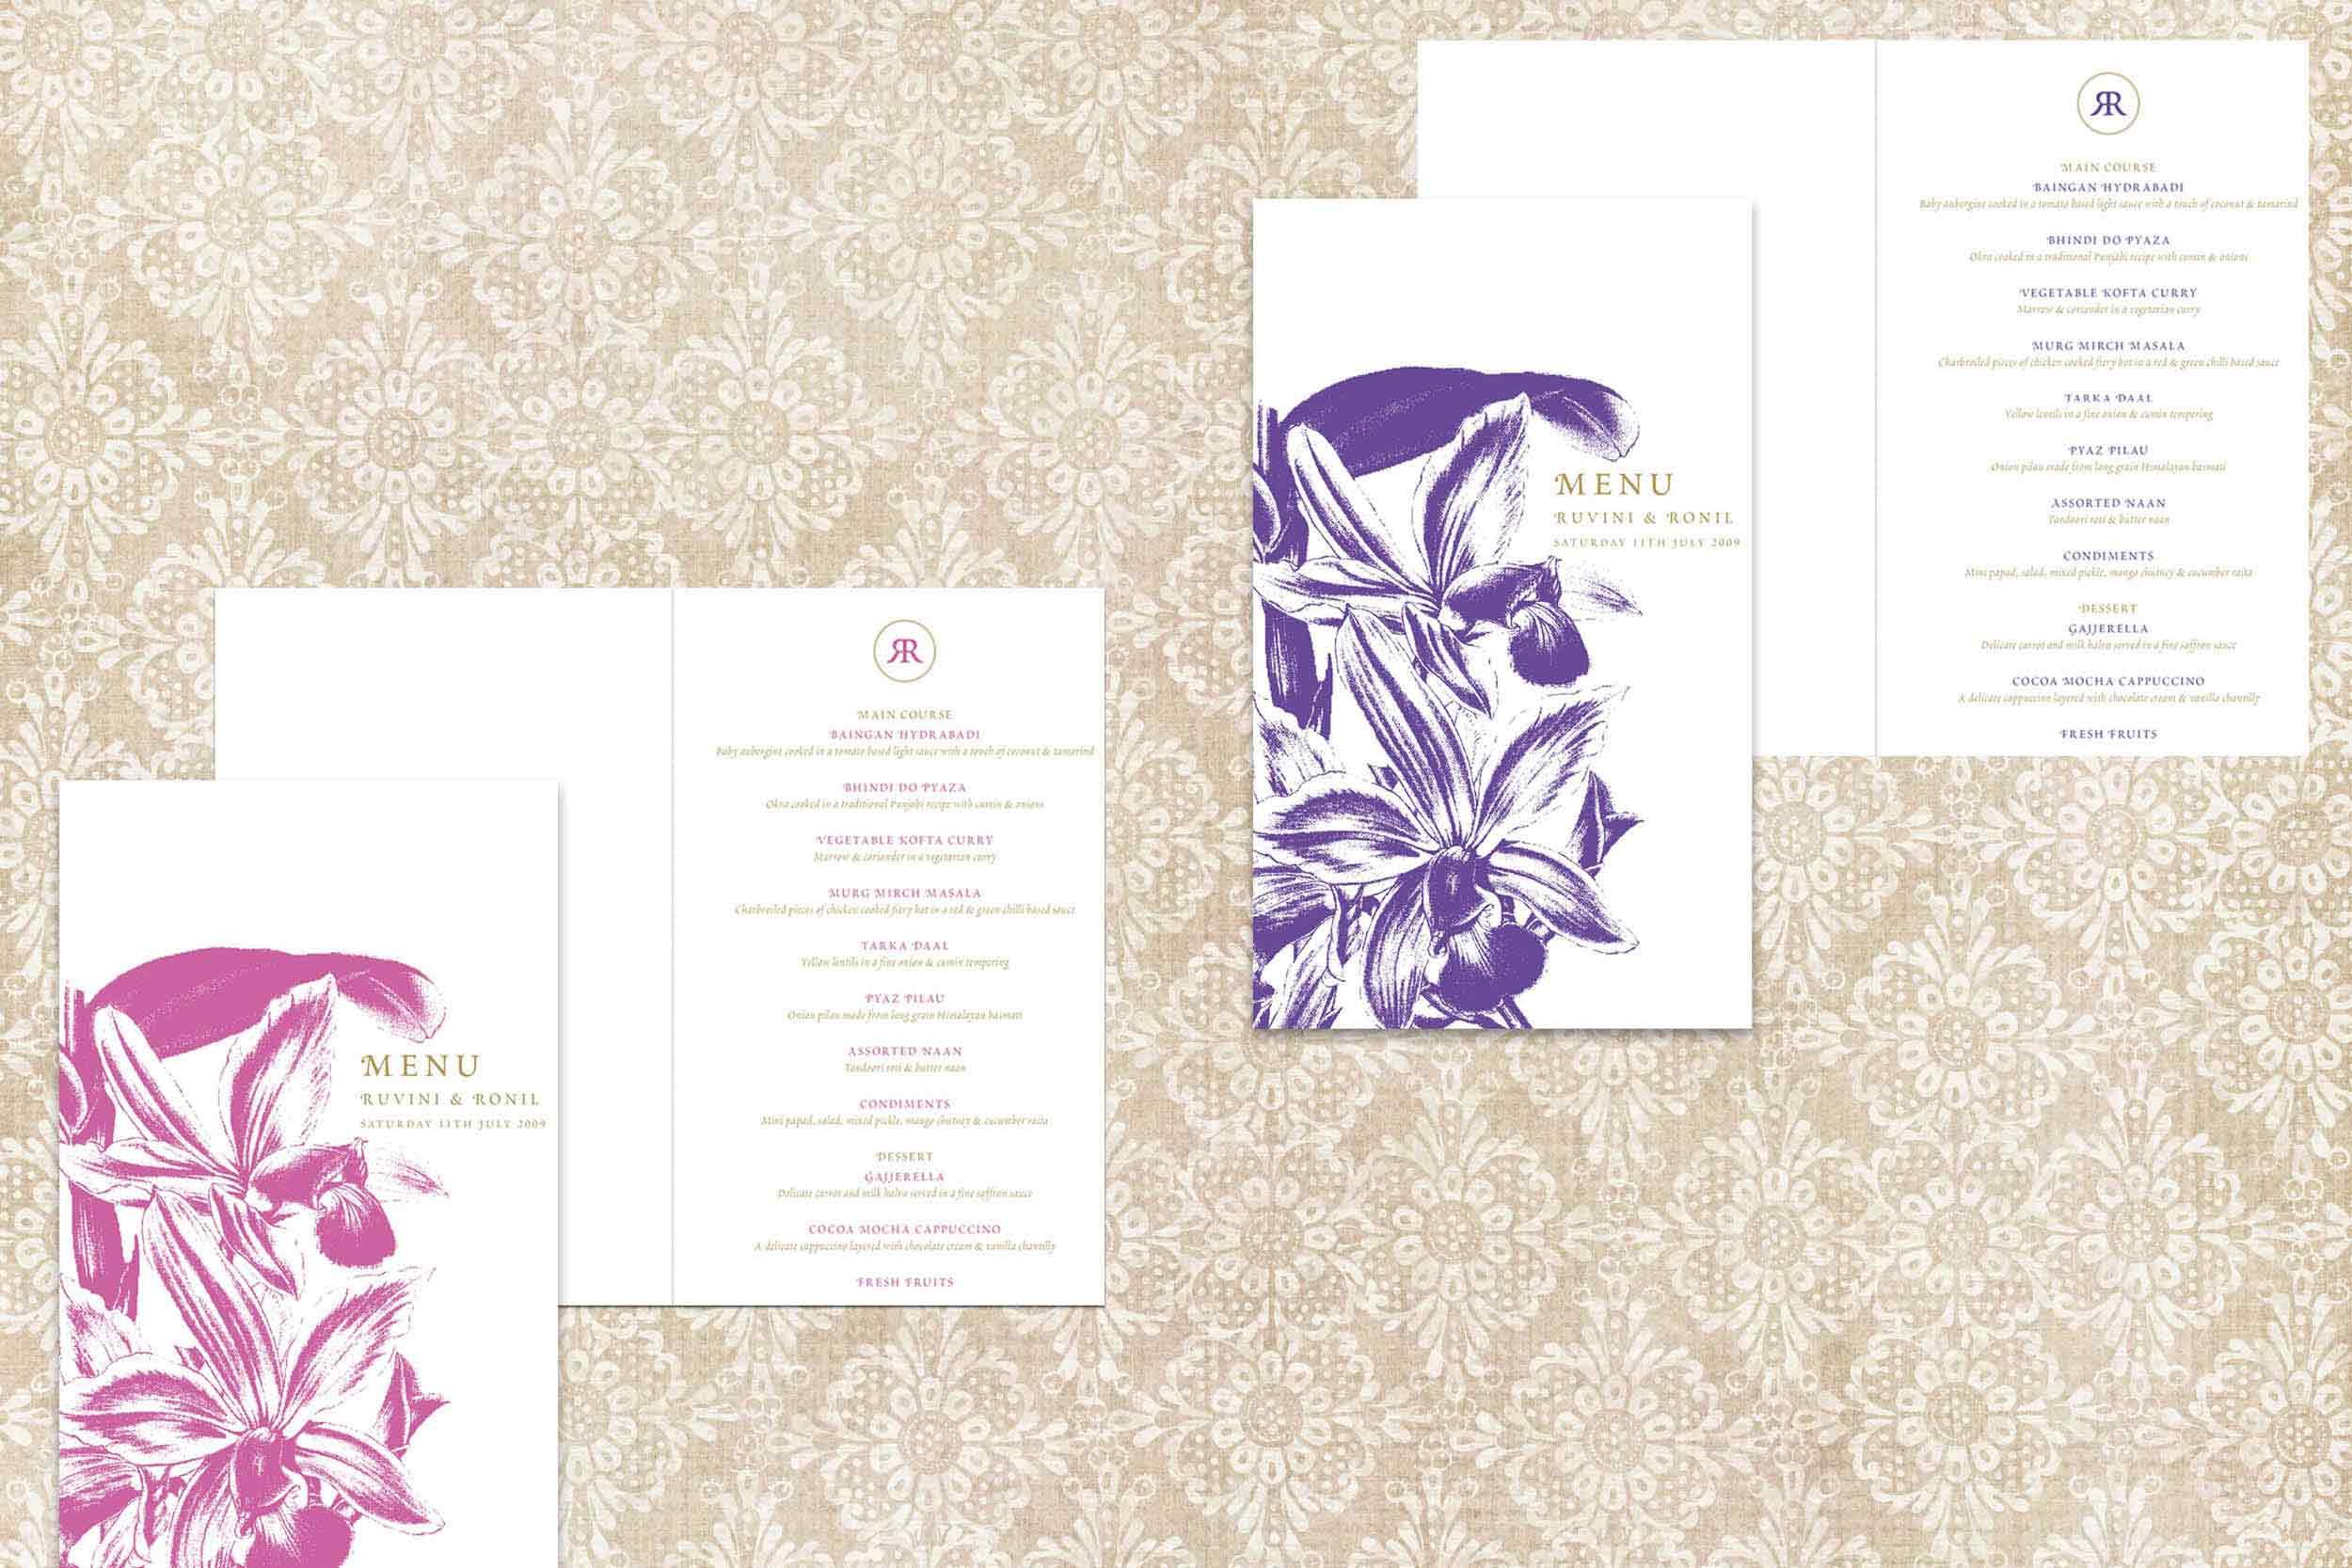 Orchid_wedding menus_bespoke_ananyacards.com.jpg